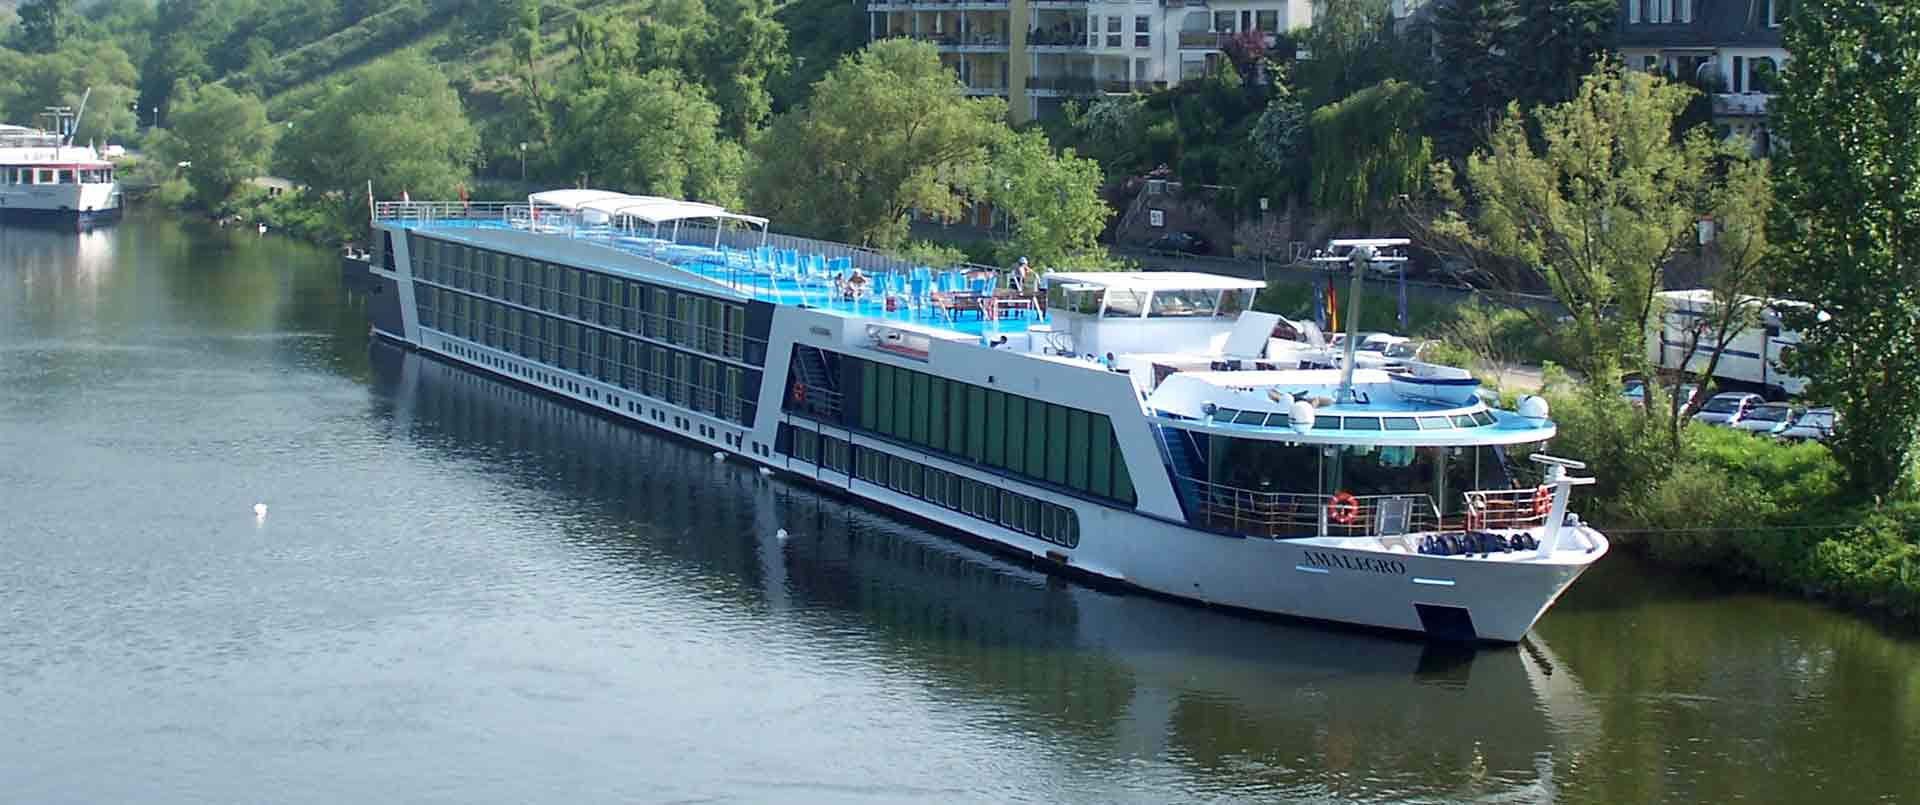 AmaLegro: Paris and Normandy River Cruise